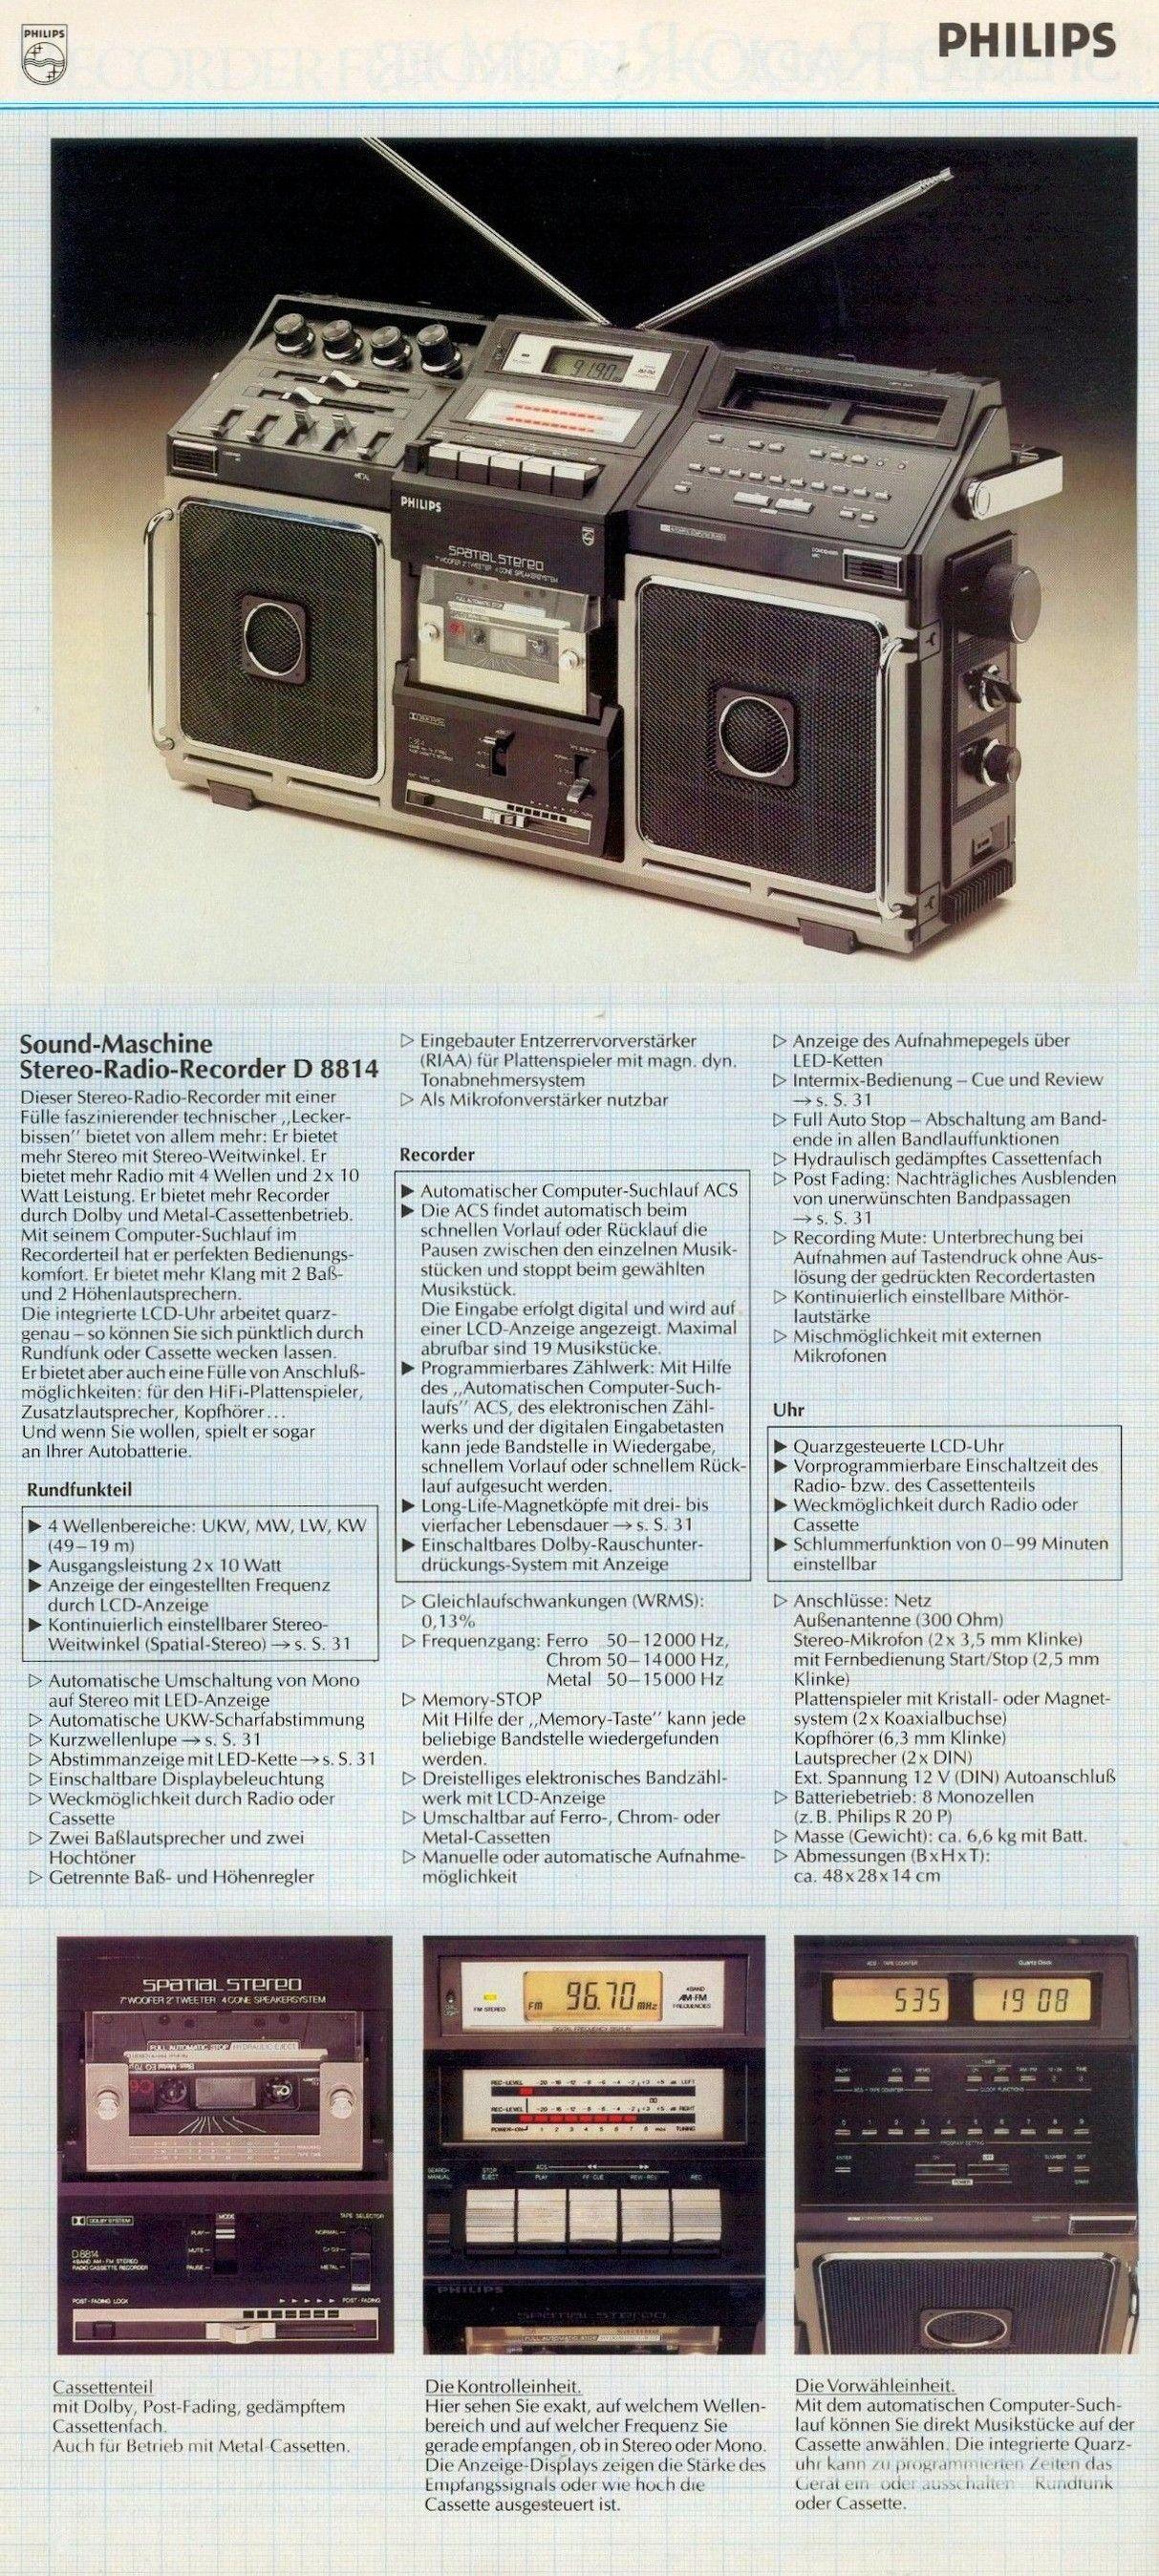 Philips D 8814 Sound Machine Stereo Radio Recorder 1982